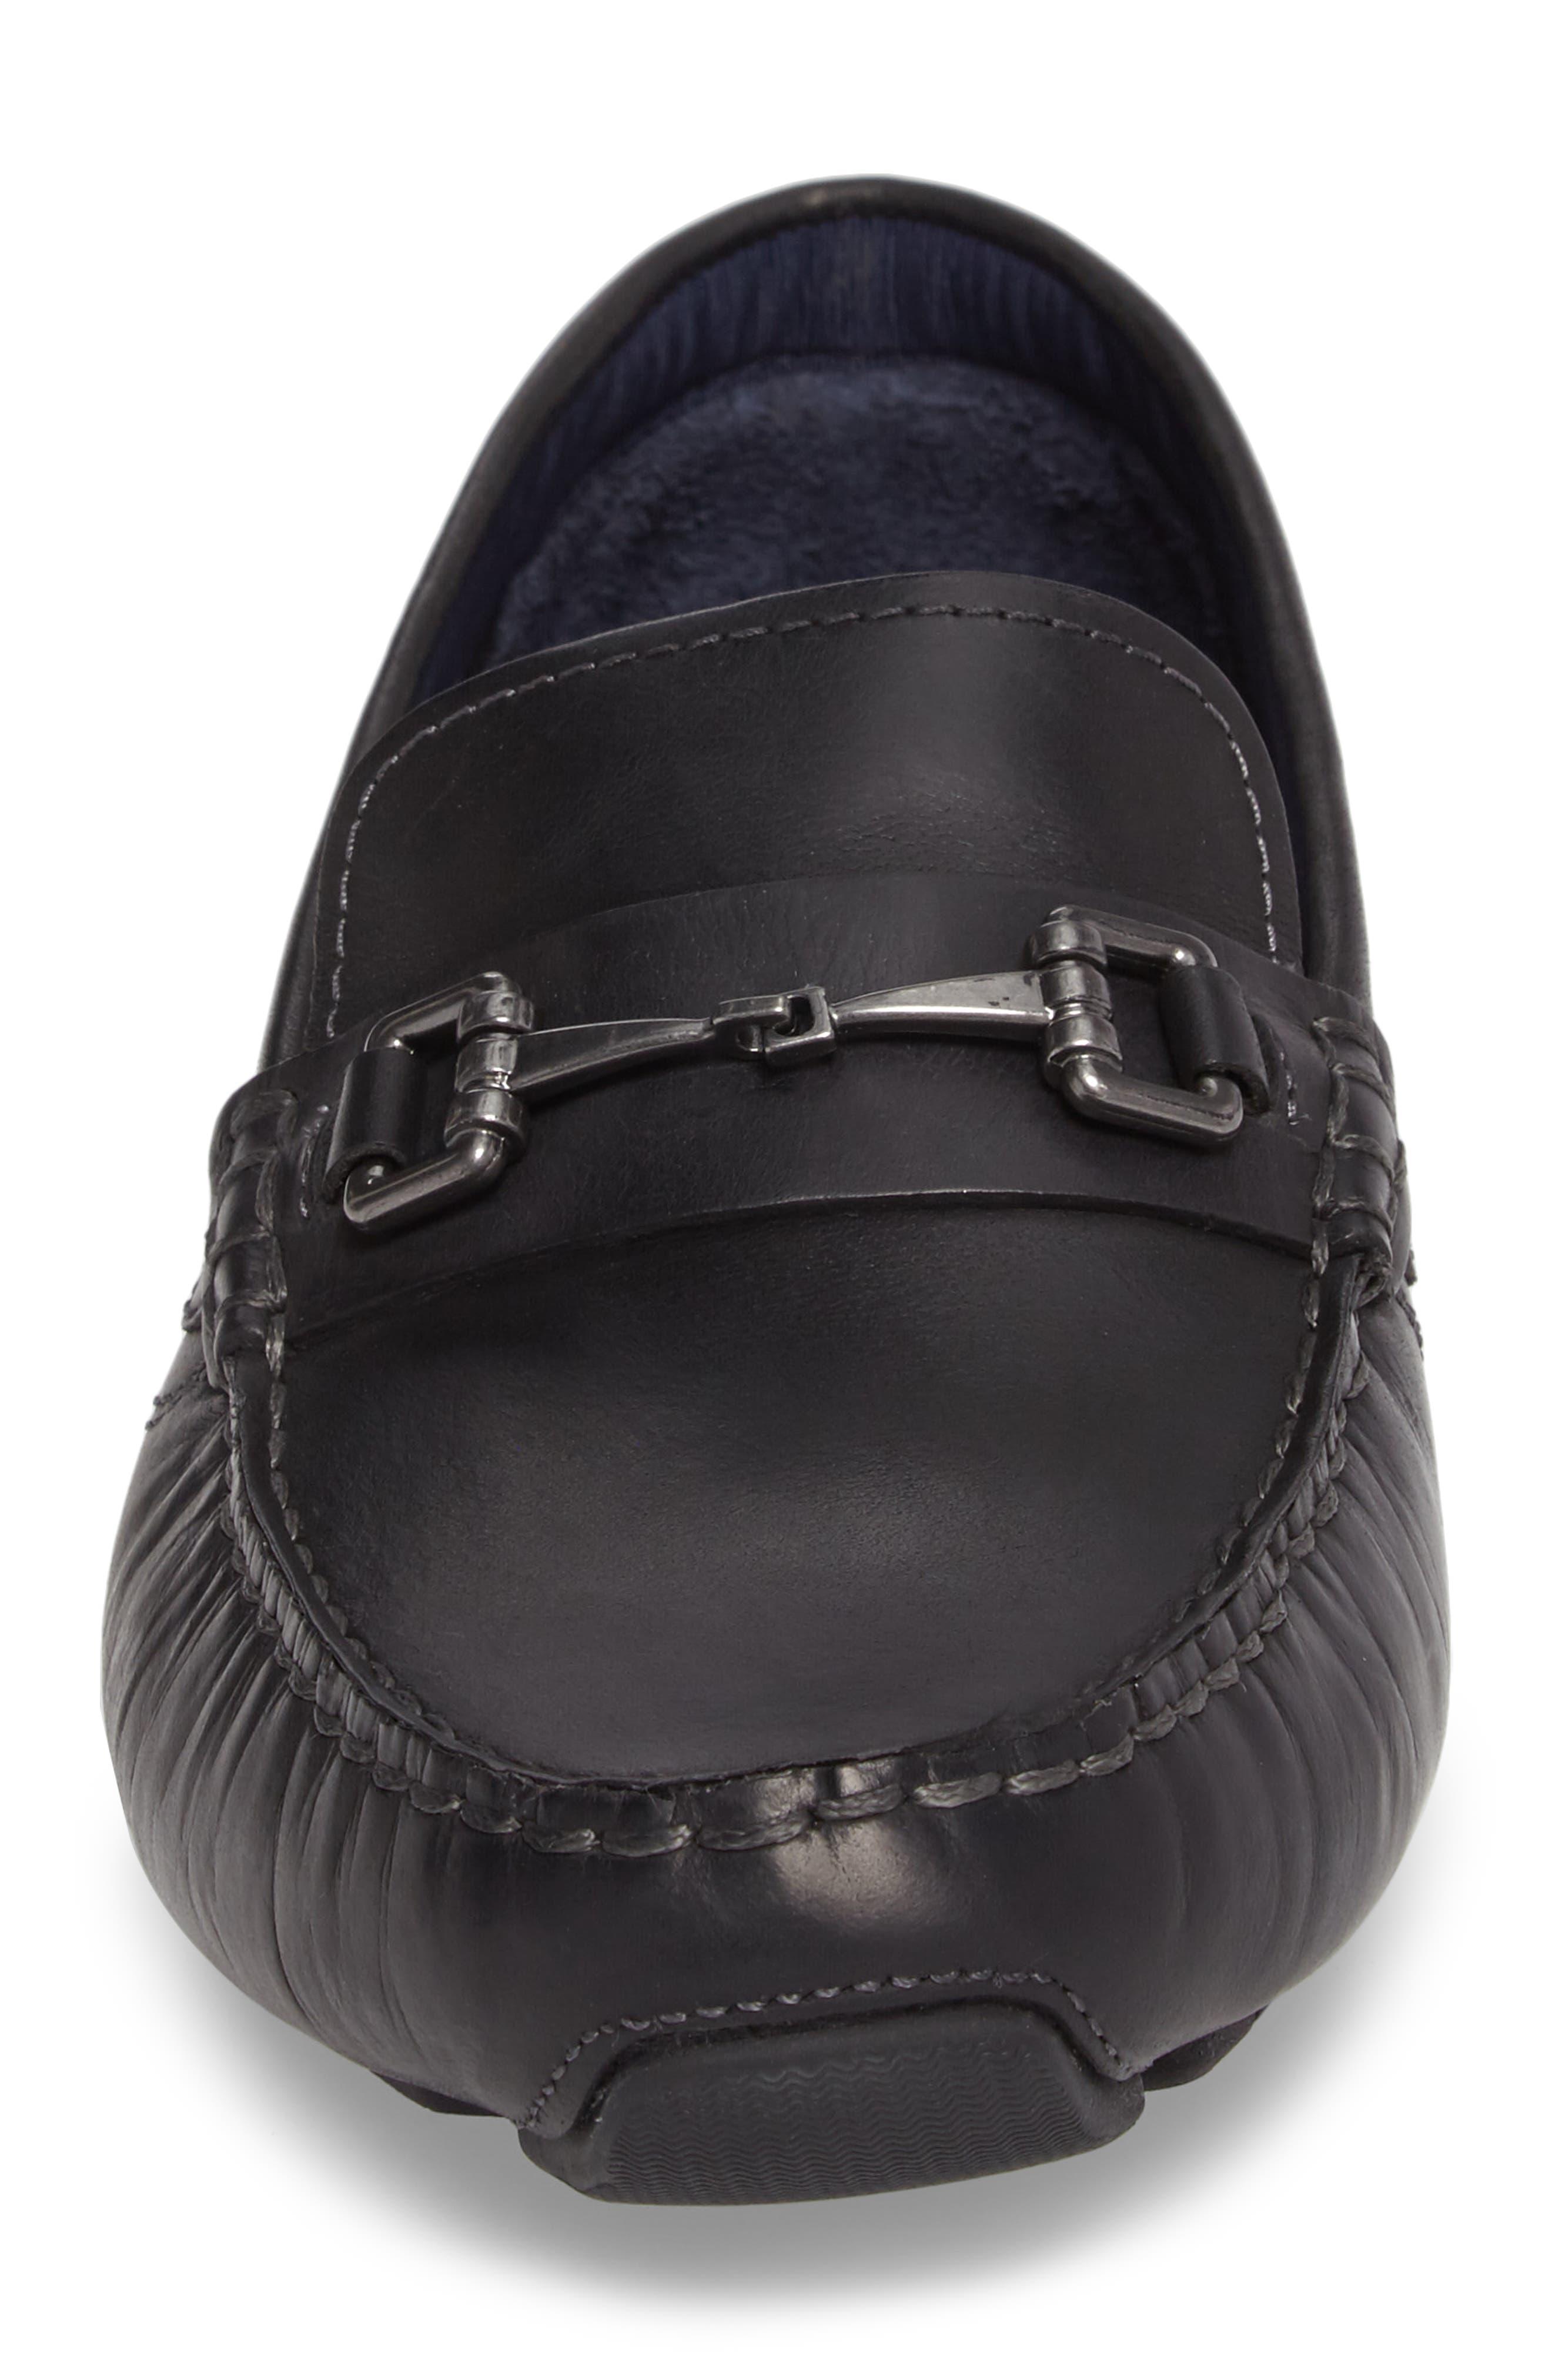 Kelson Bit Driving Shoe,                             Alternate thumbnail 4, color,                             Black Leather